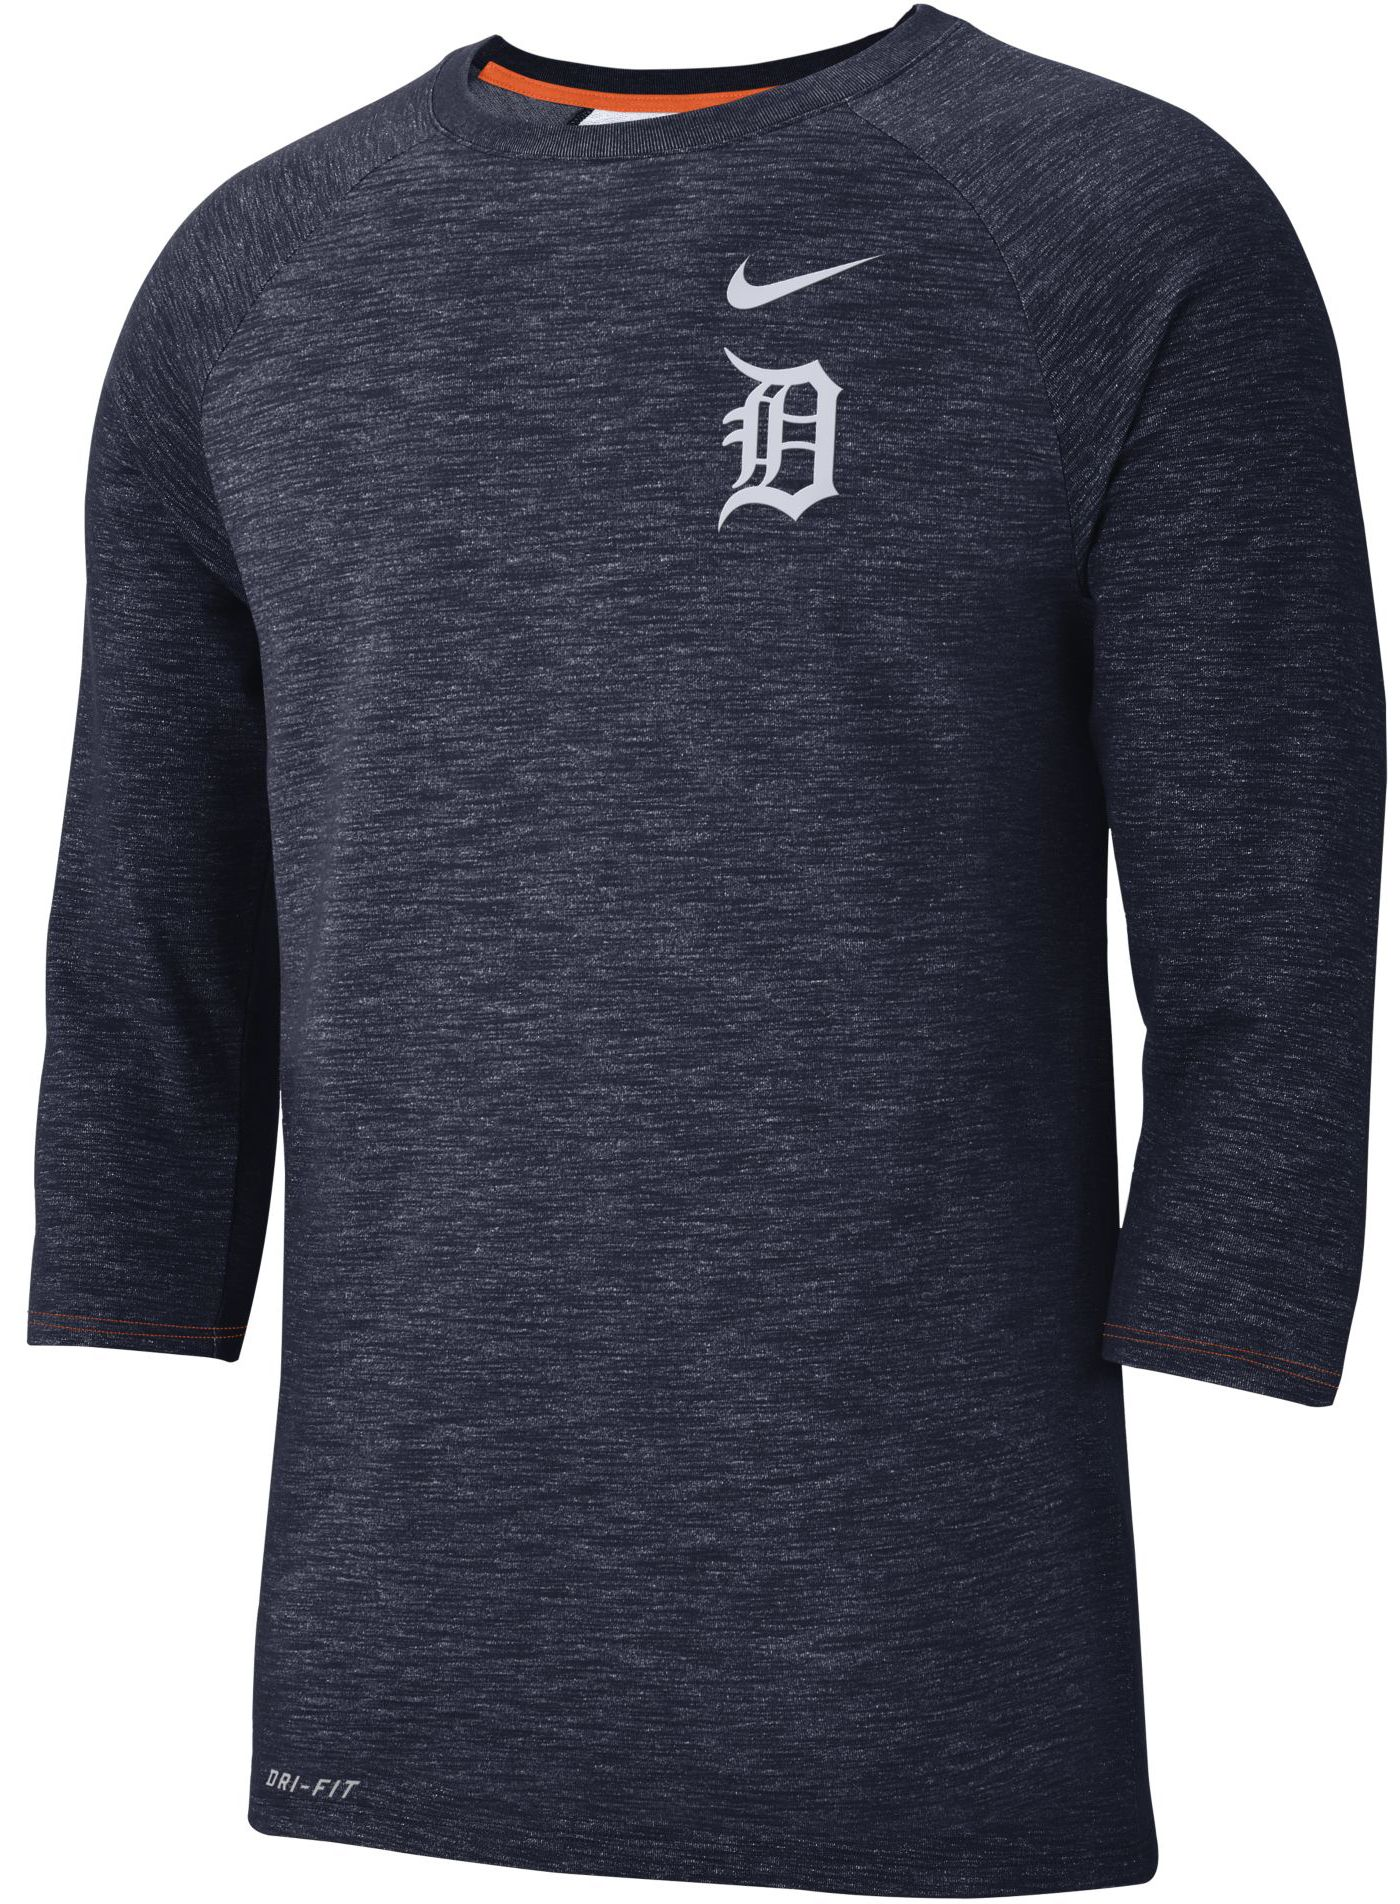 Nike Men's Detroit Tigers Dri-FIT Slub Three-Quarter Sleeve Shirt